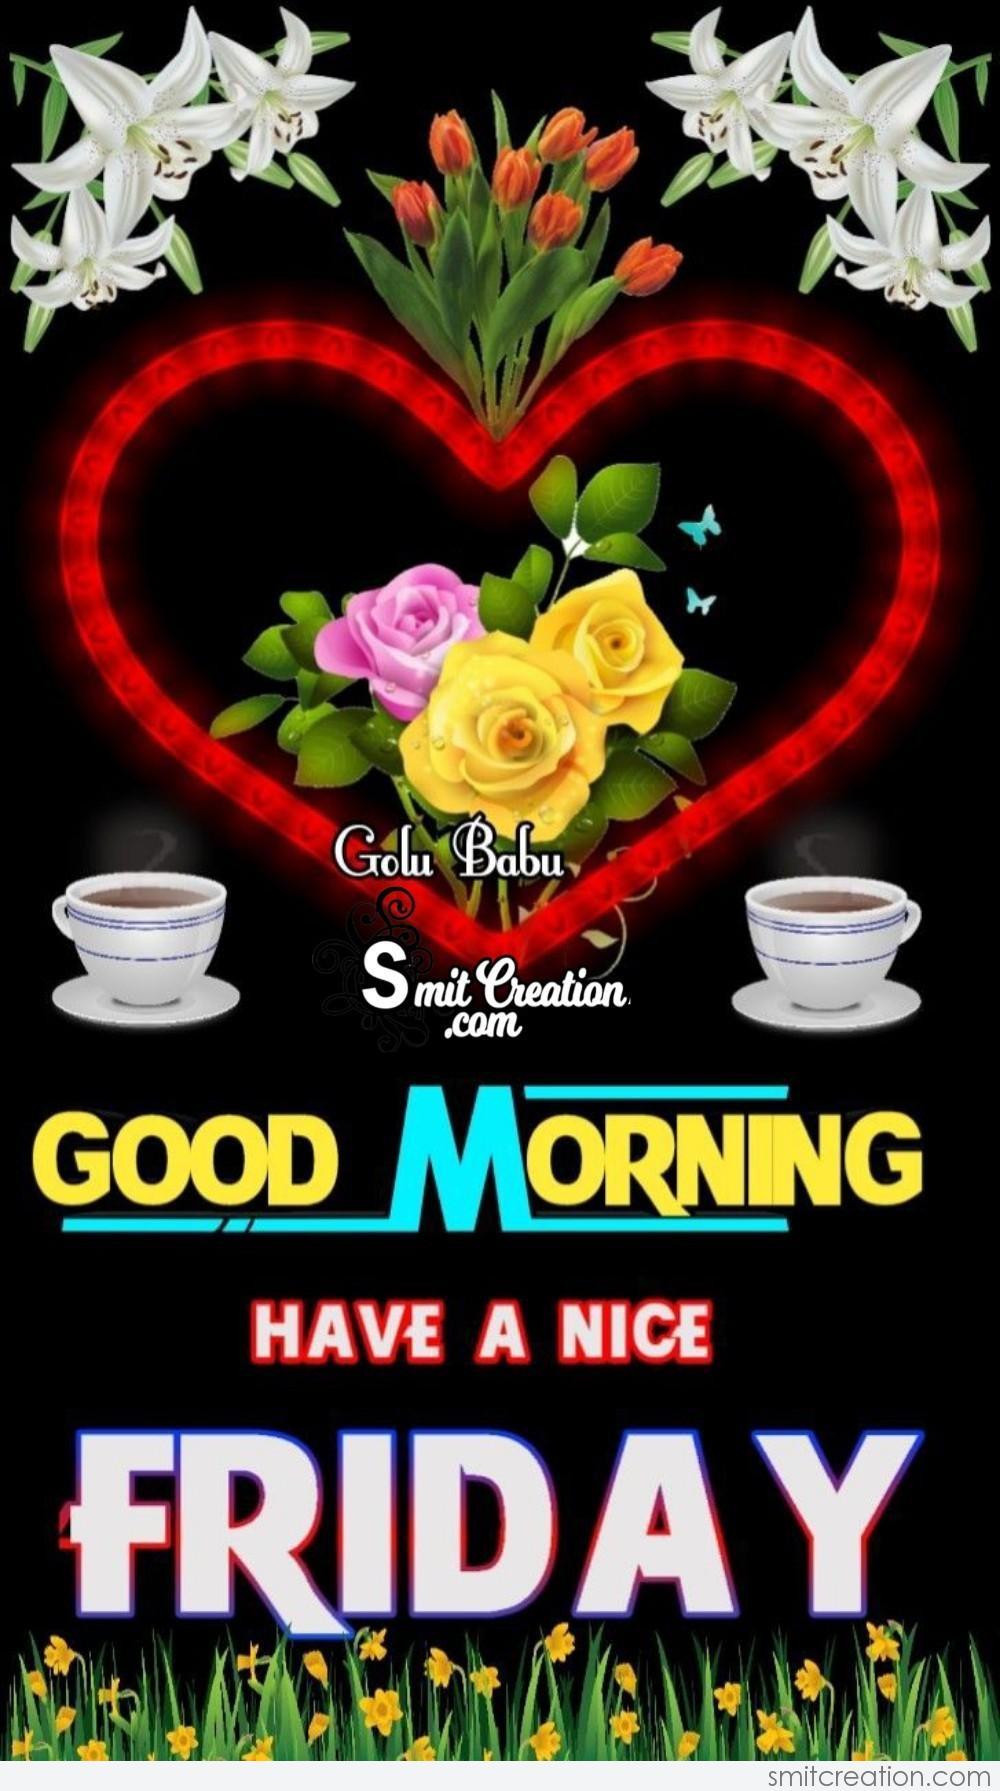 Good Morning Have A Nice Friday Smitcreation Com